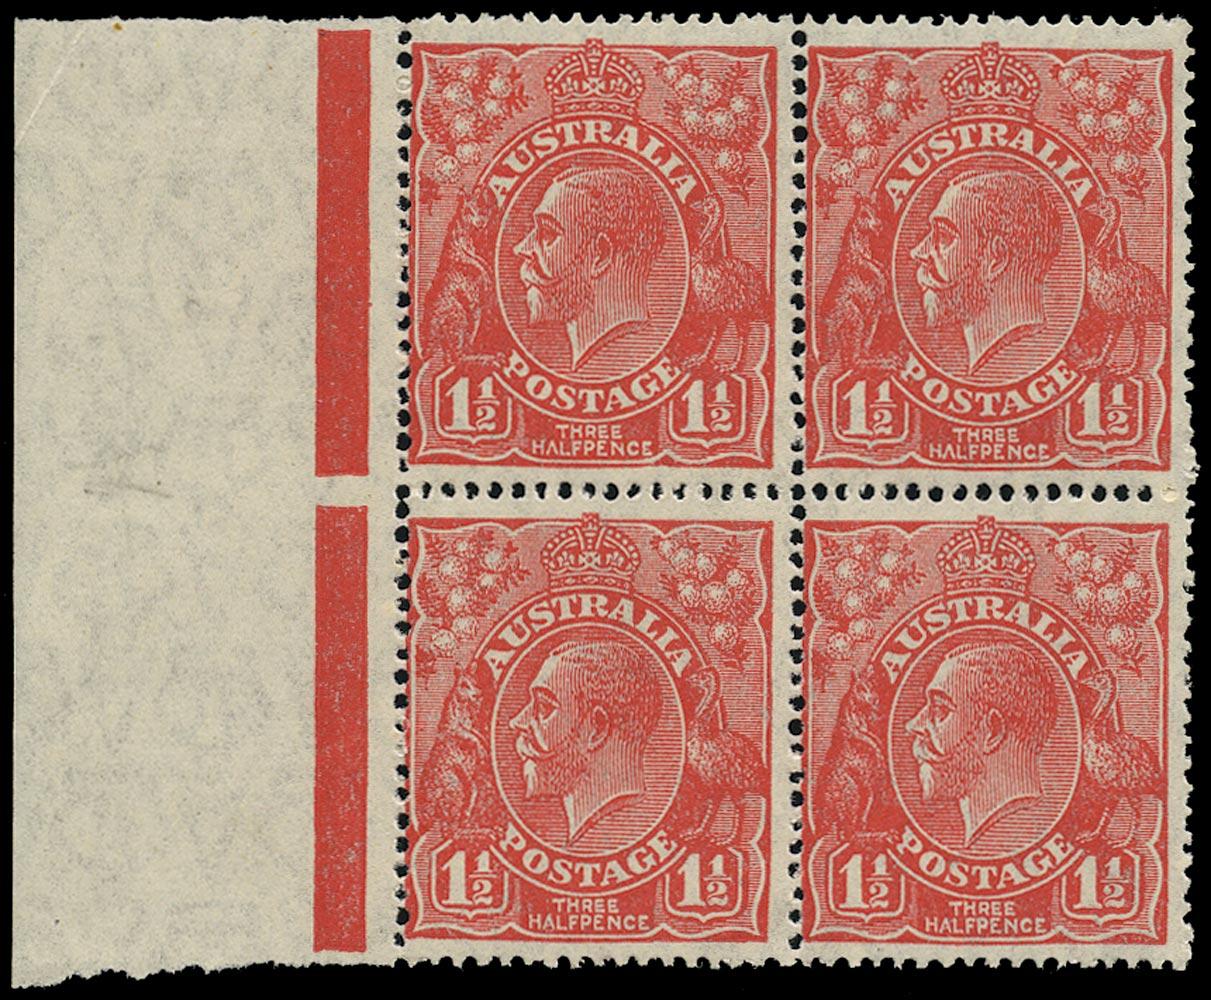 AUSTRALIA 1926  SG87w Mint KGV 1½d scarlet small multiple watermark variety watermark inverted